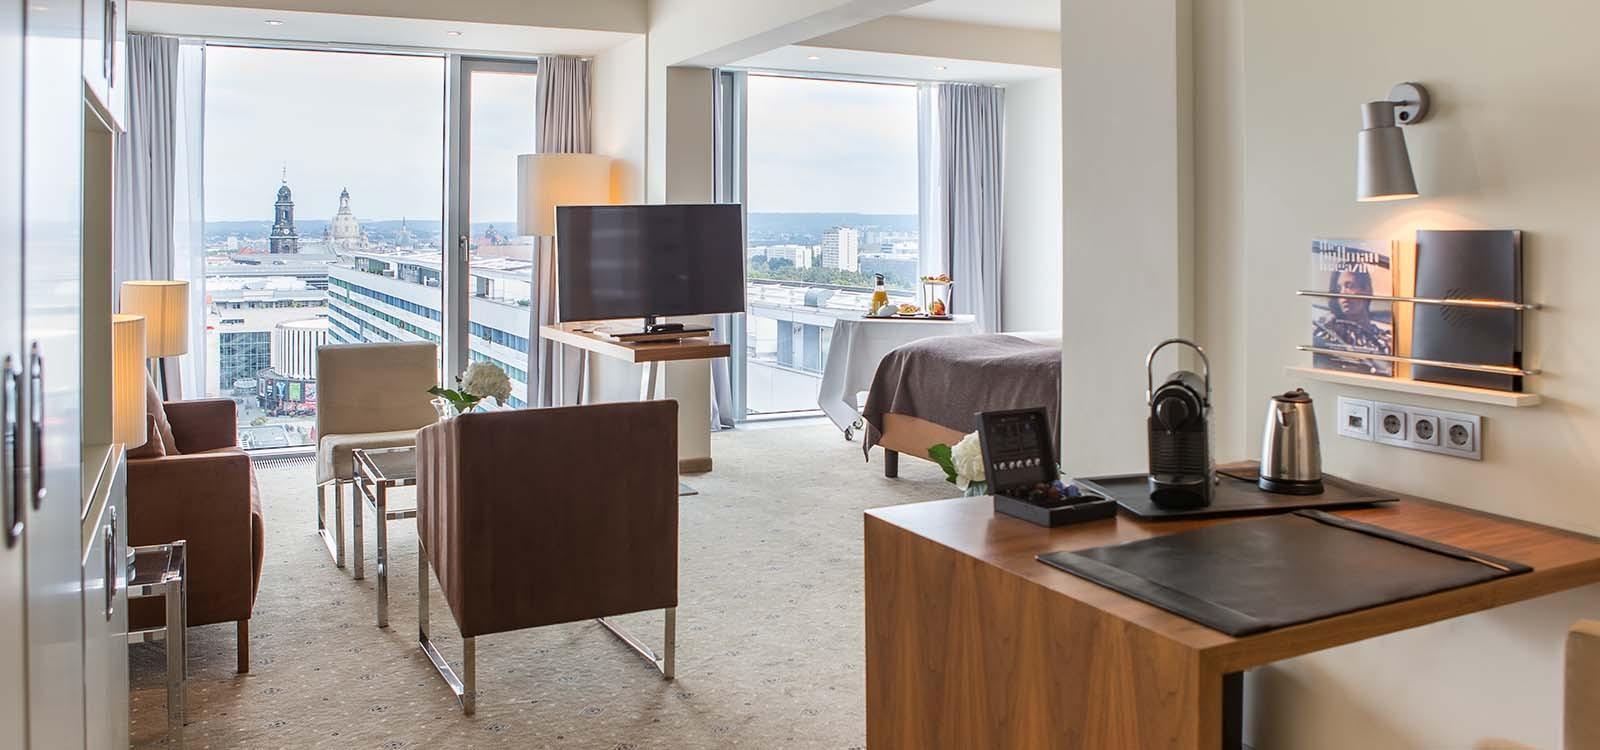 Pullman Dresden - EVENT Hotels - Intl  Markenhotellerie in